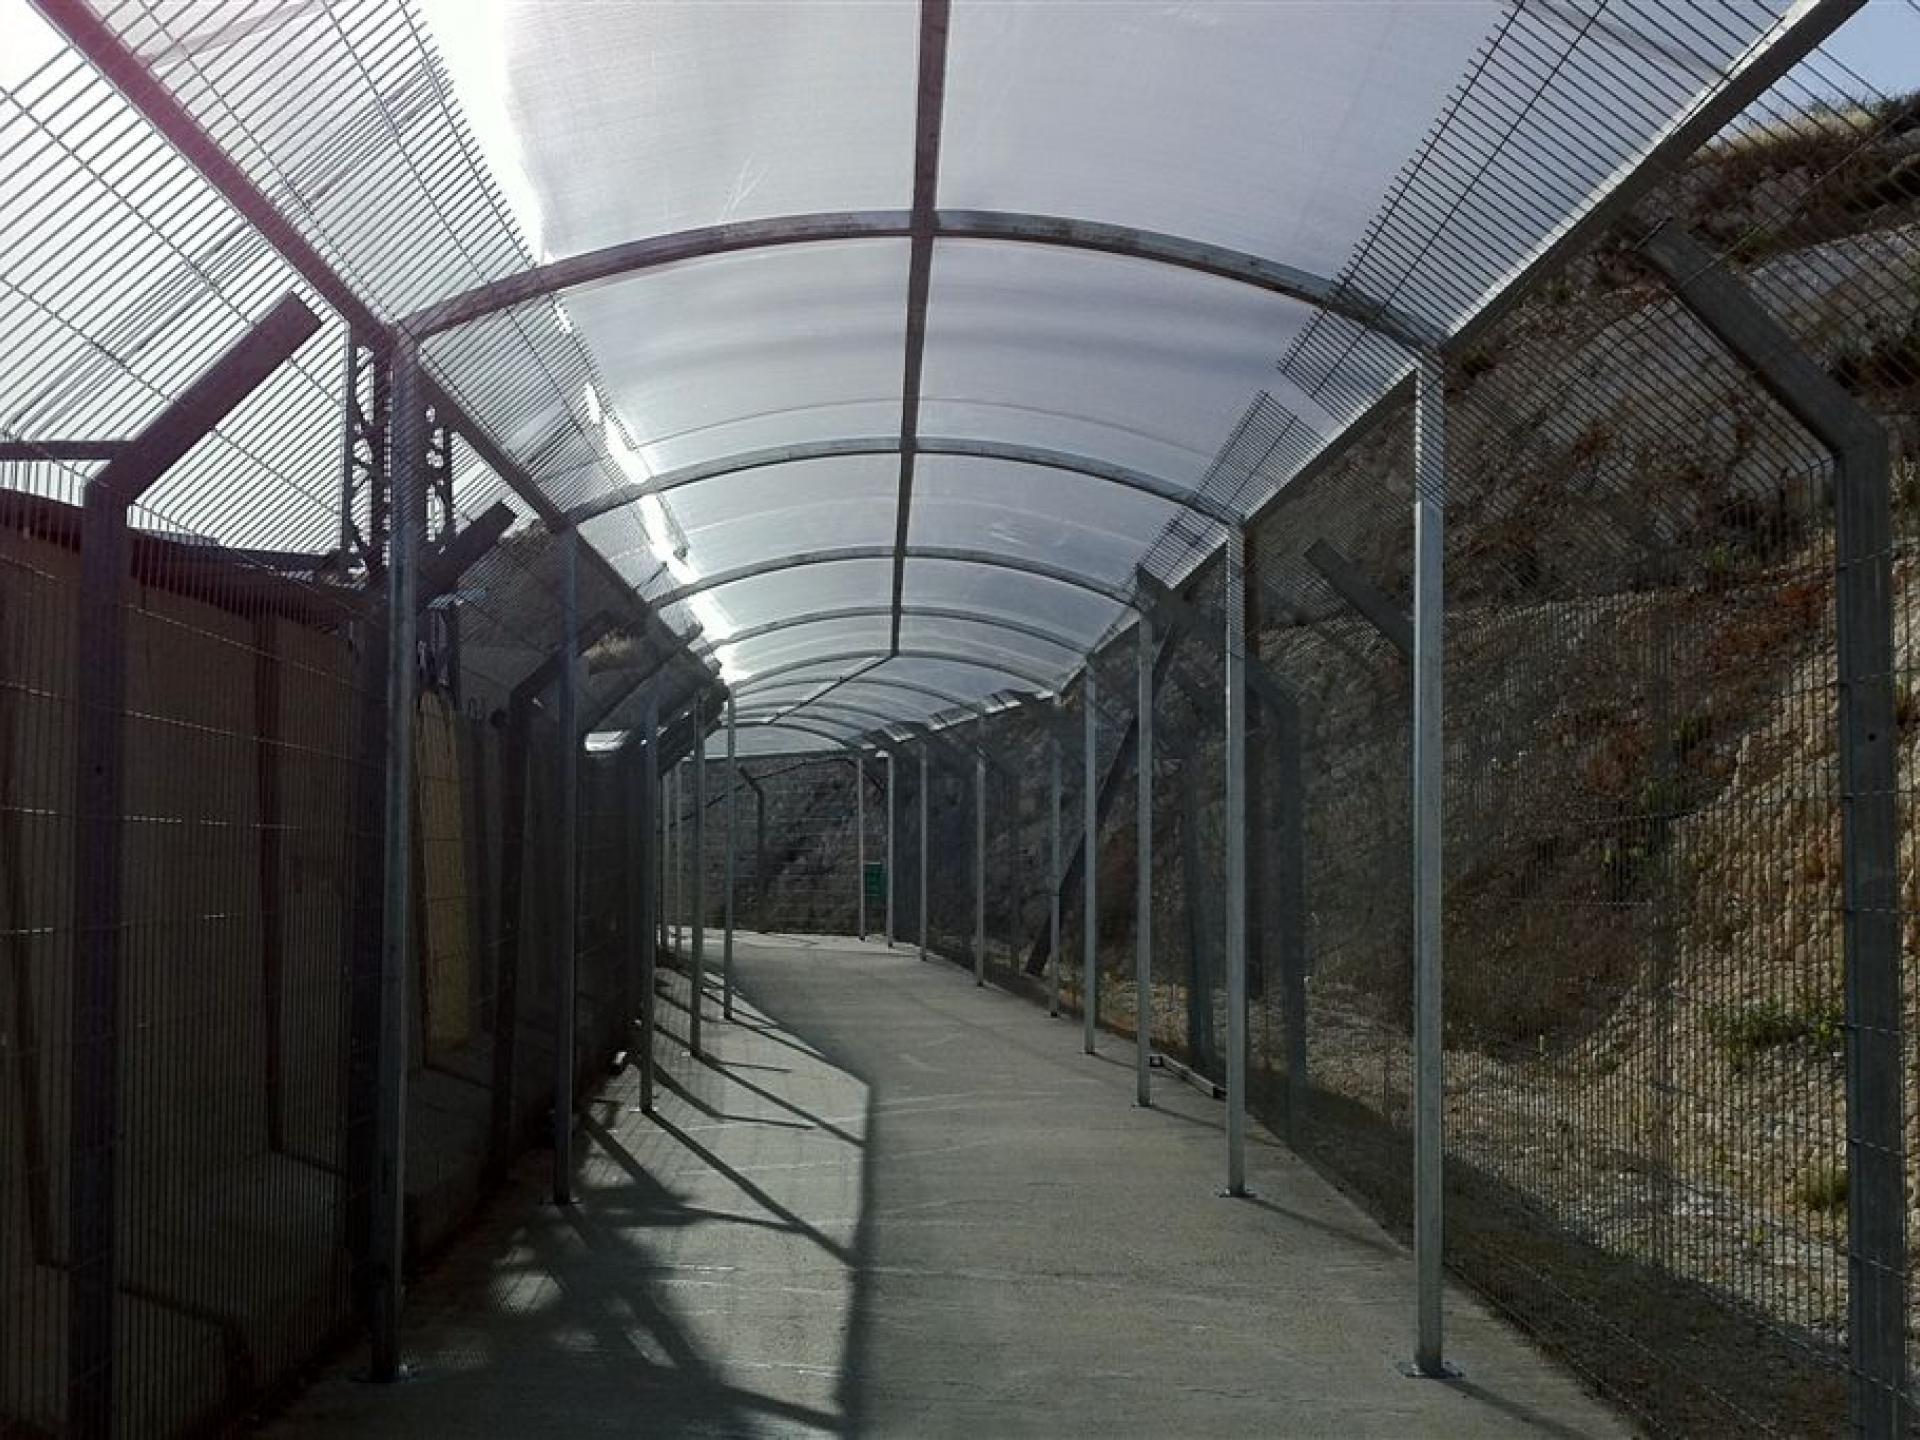 Barta'a/Reikhan checkpoint 22.04.12